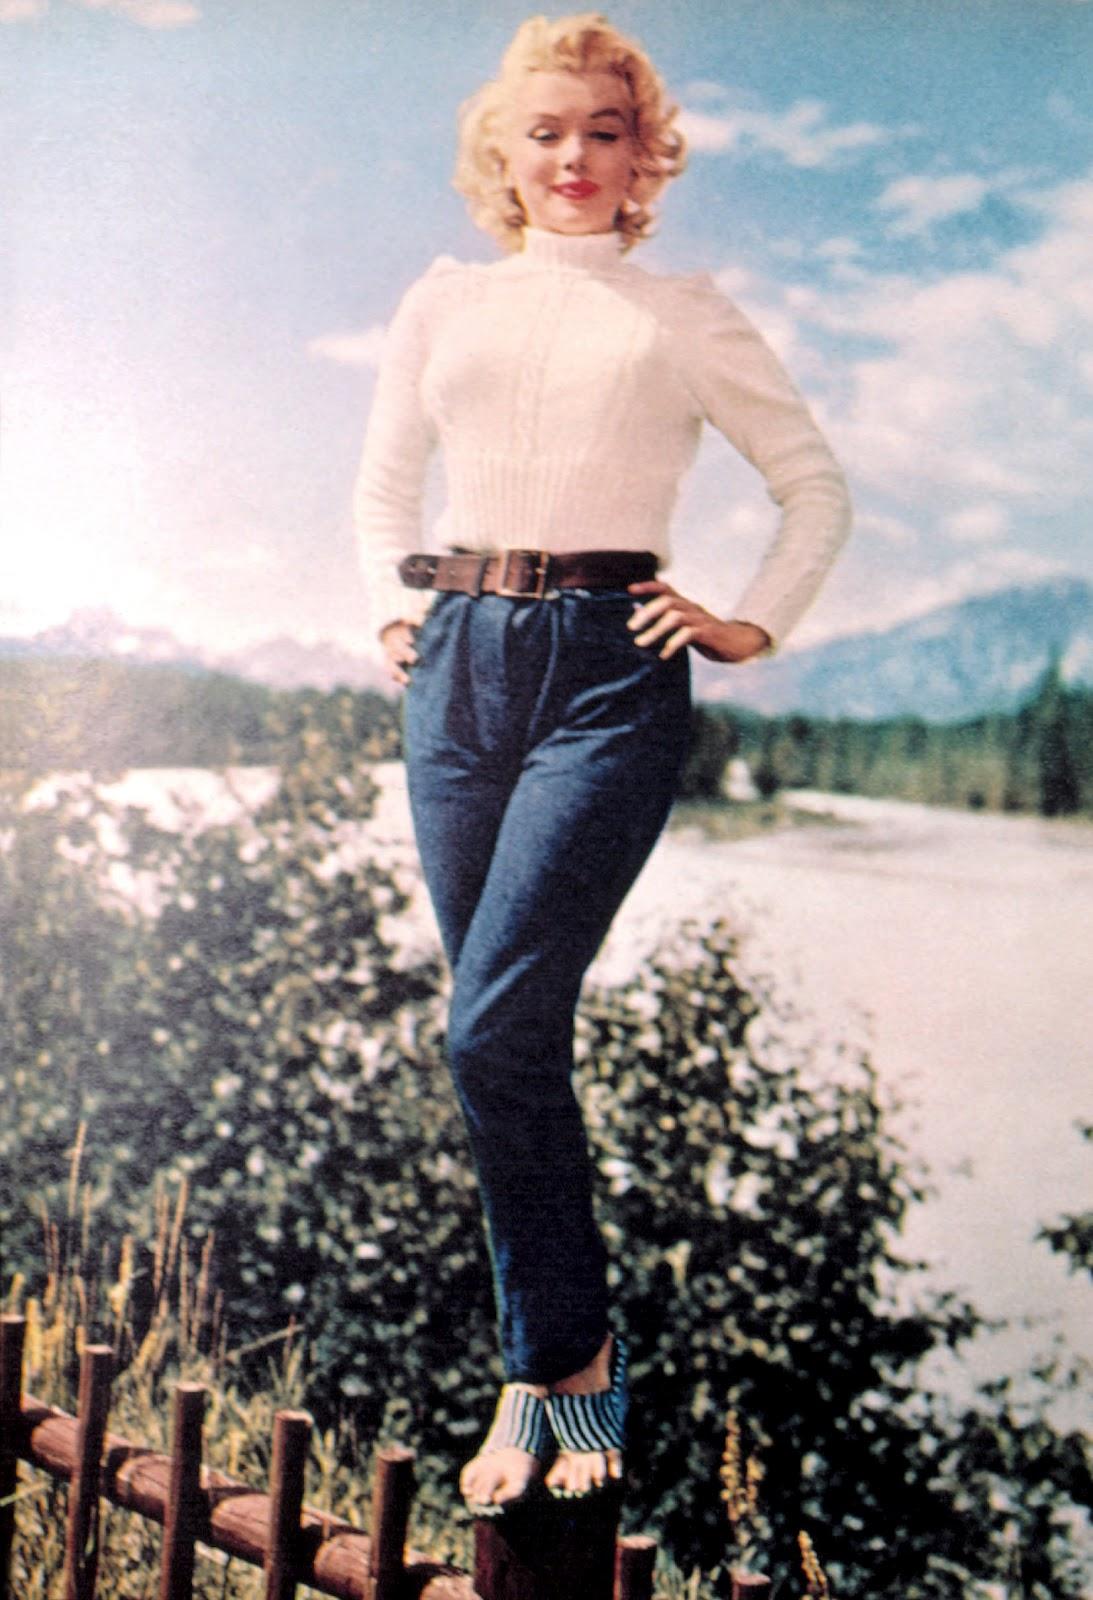 http://3.bp.blogspot.com/-oeAFNfb47h0/T7xgdkzSU-I/AAAAAAAAADo/rpADND_iGss/s1600/Marilyn-Monroe-1960s.jpg